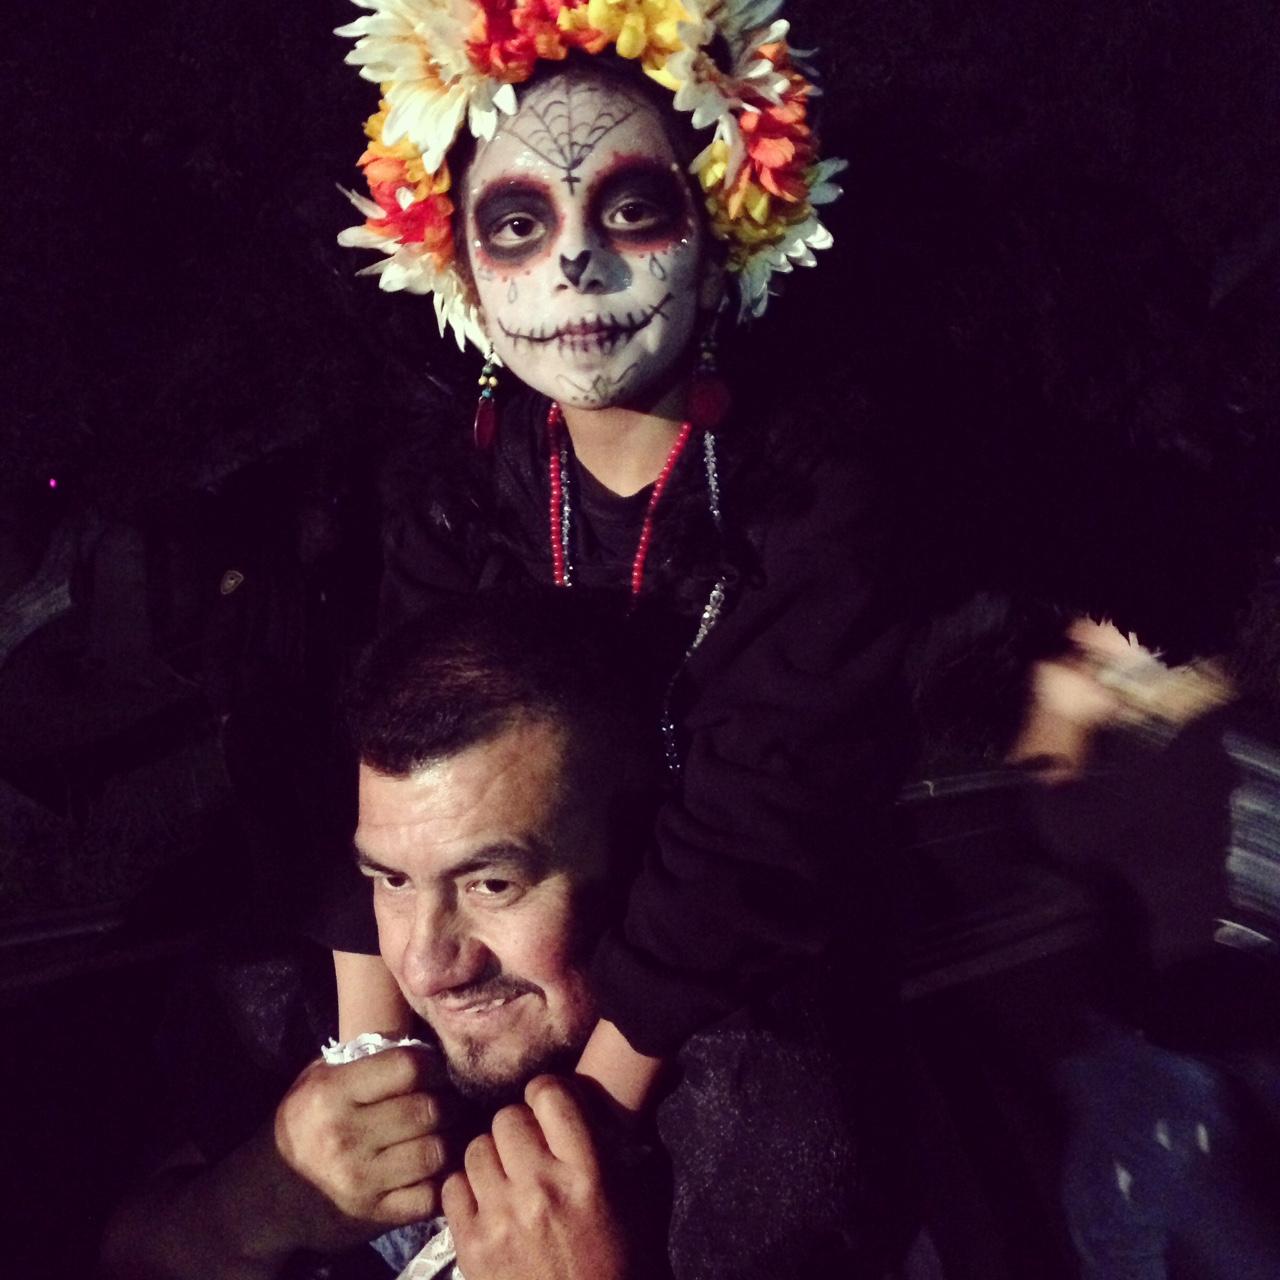 Father and Daughter at Dia de Los Muertos